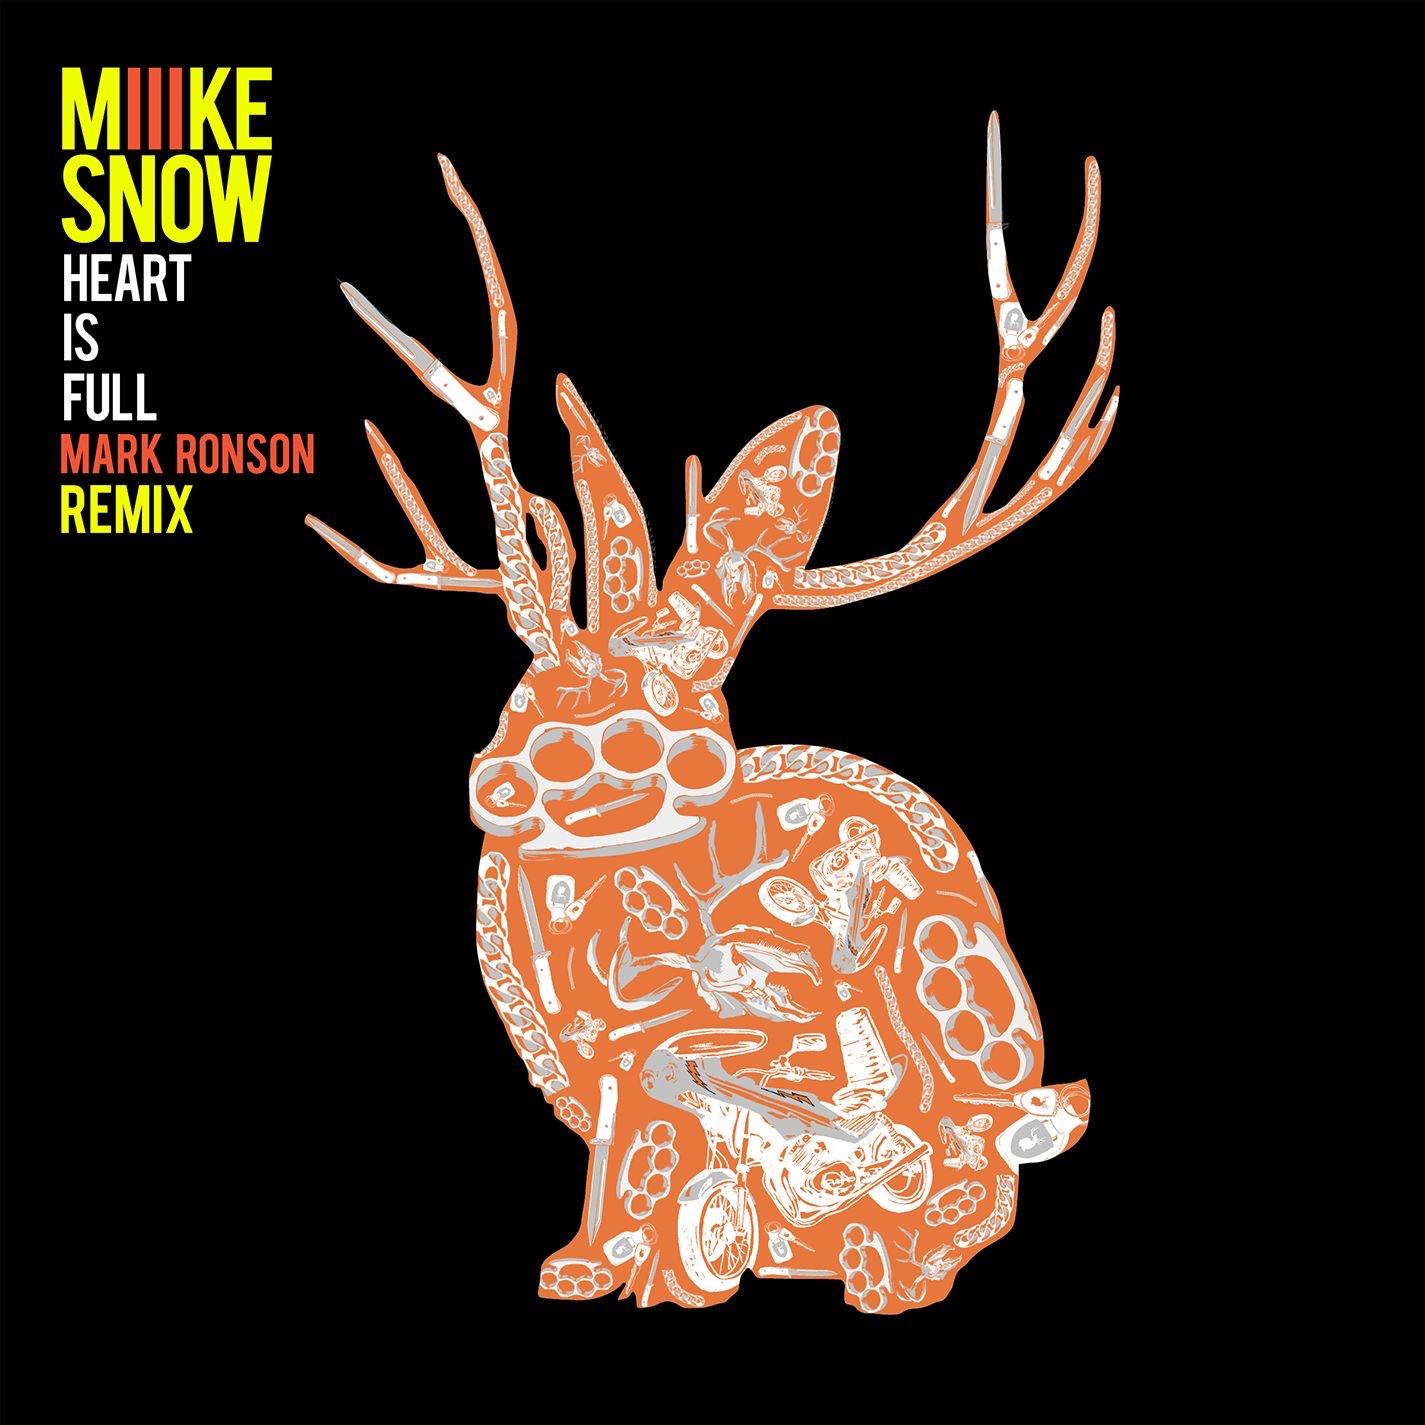 Heart Is Full (Mark Ronson Remix) - Single